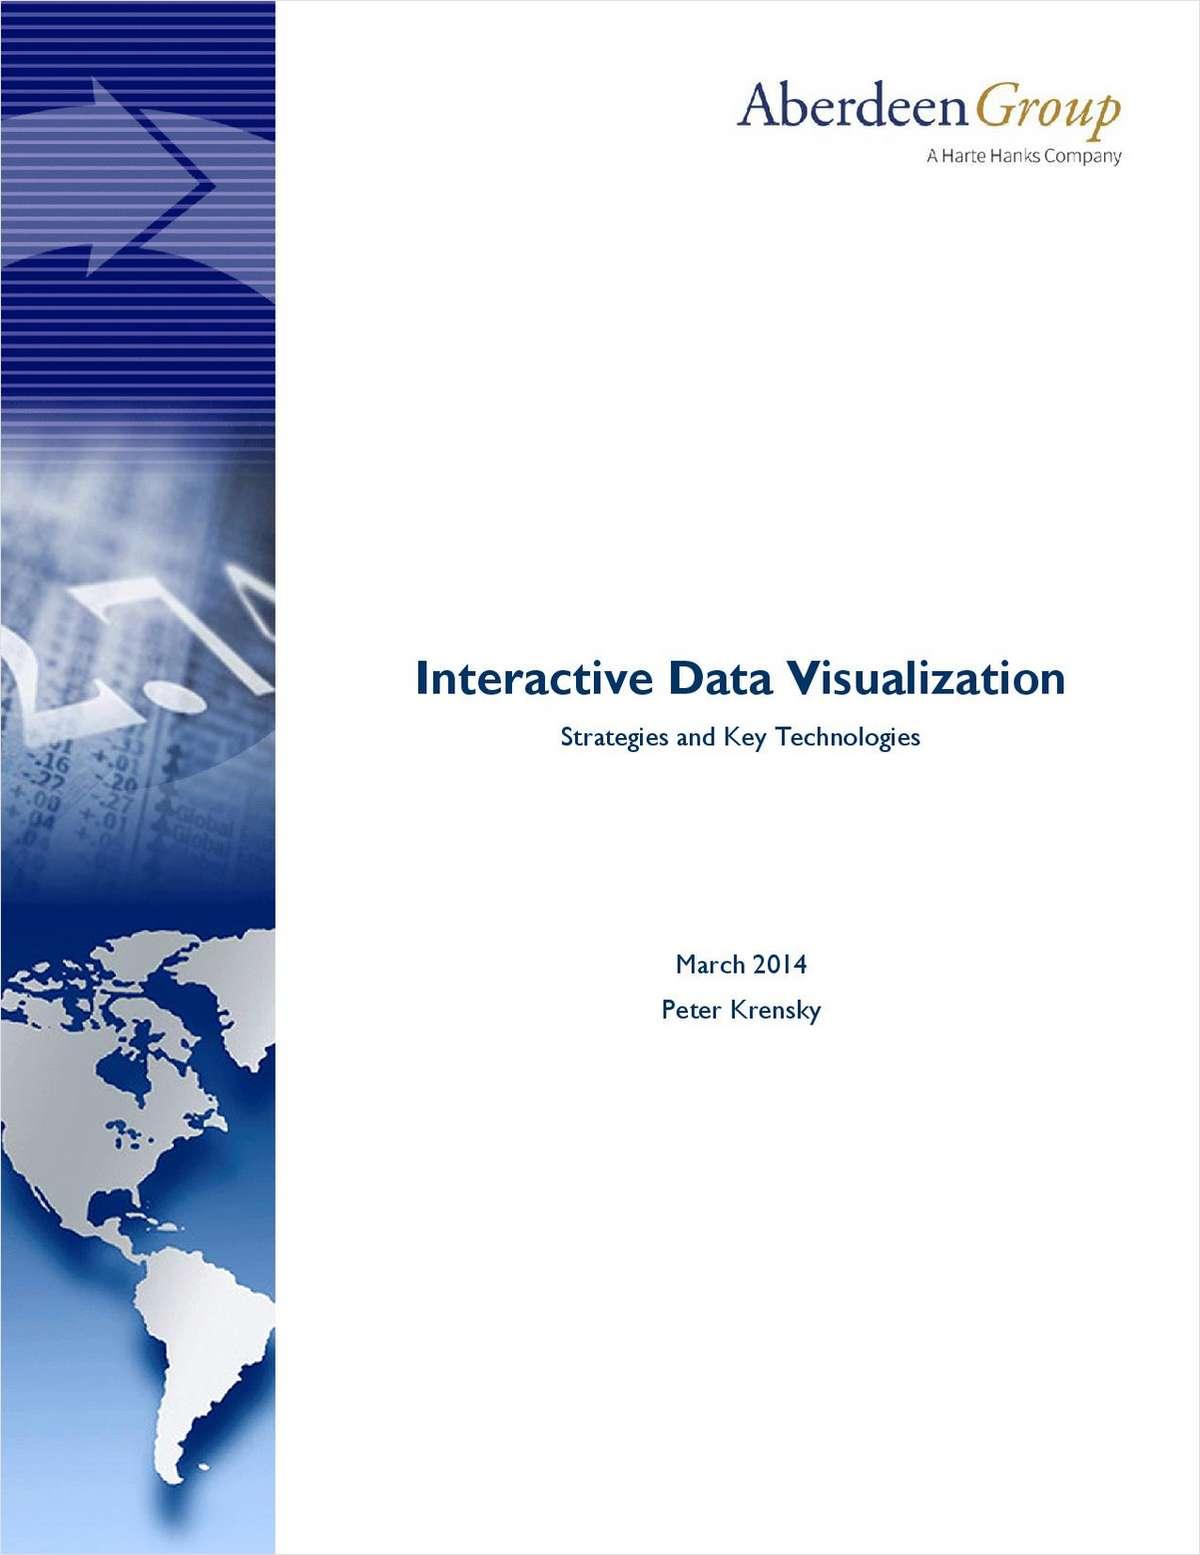 Interactive Data Visualization: Strategies and Key Technologies